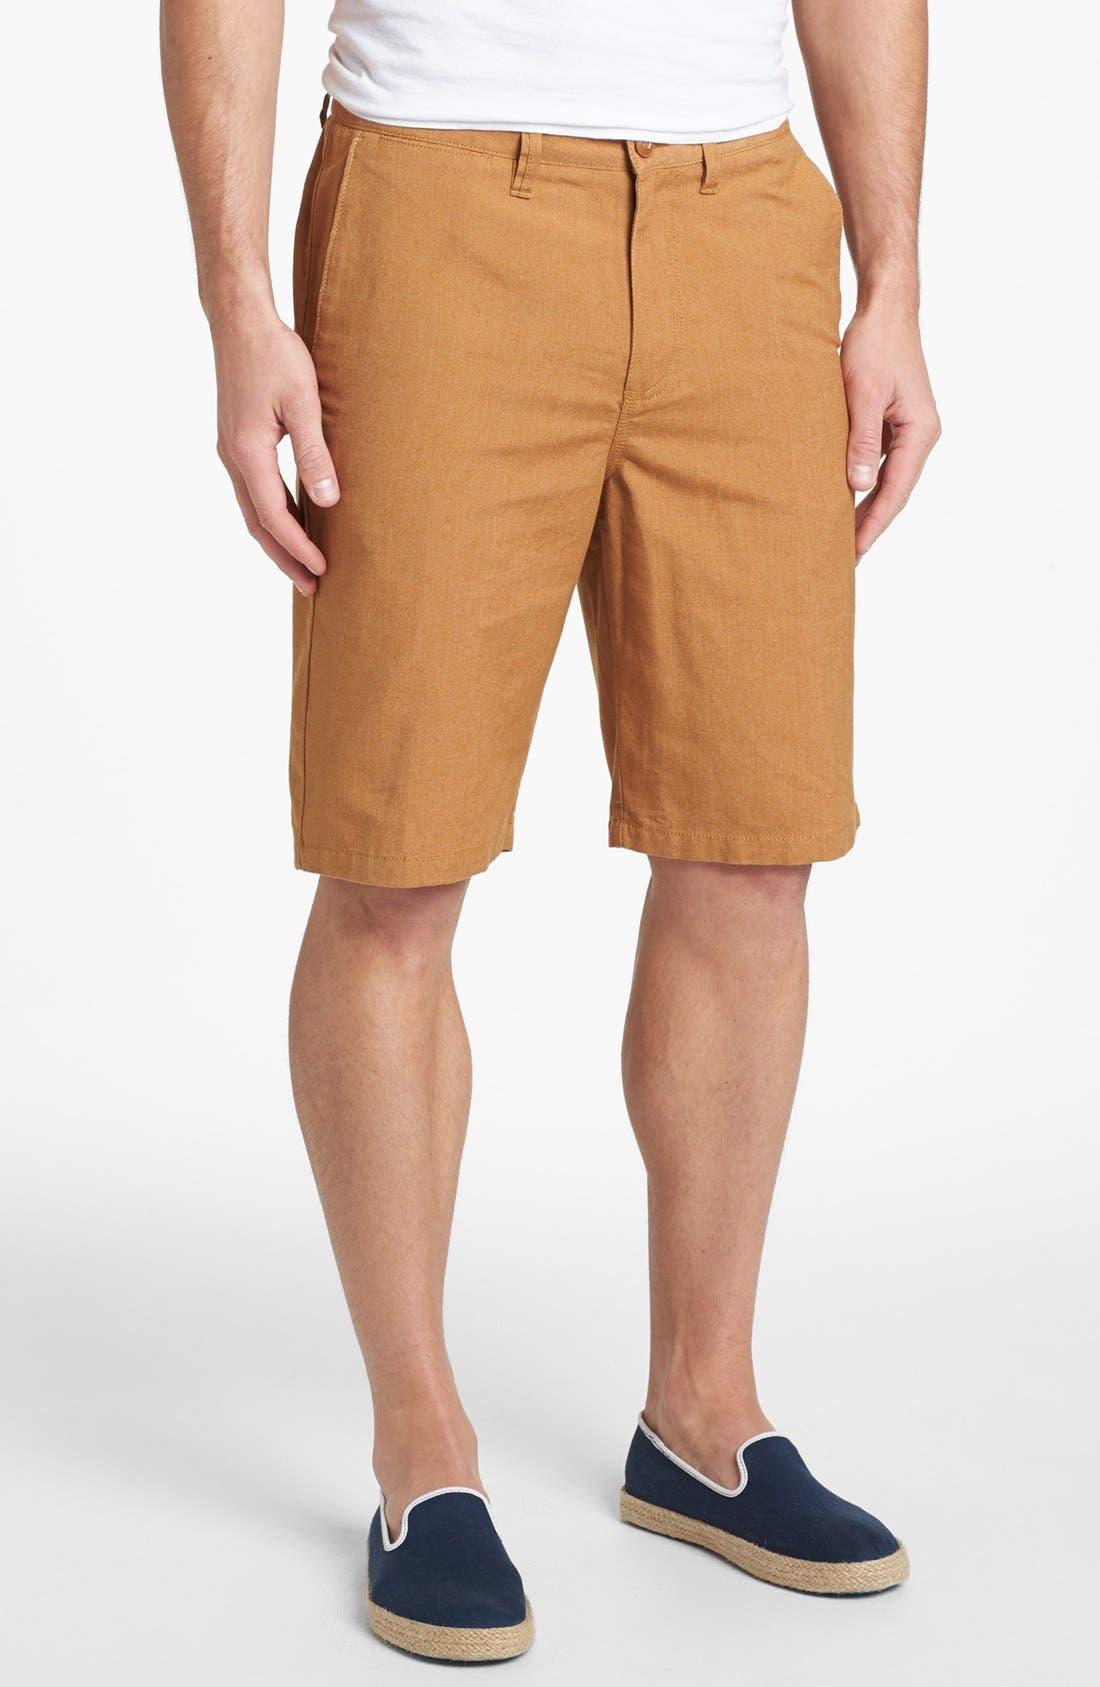 Alternate Image 1 Selected - Vans 'Dewitt' Shorts